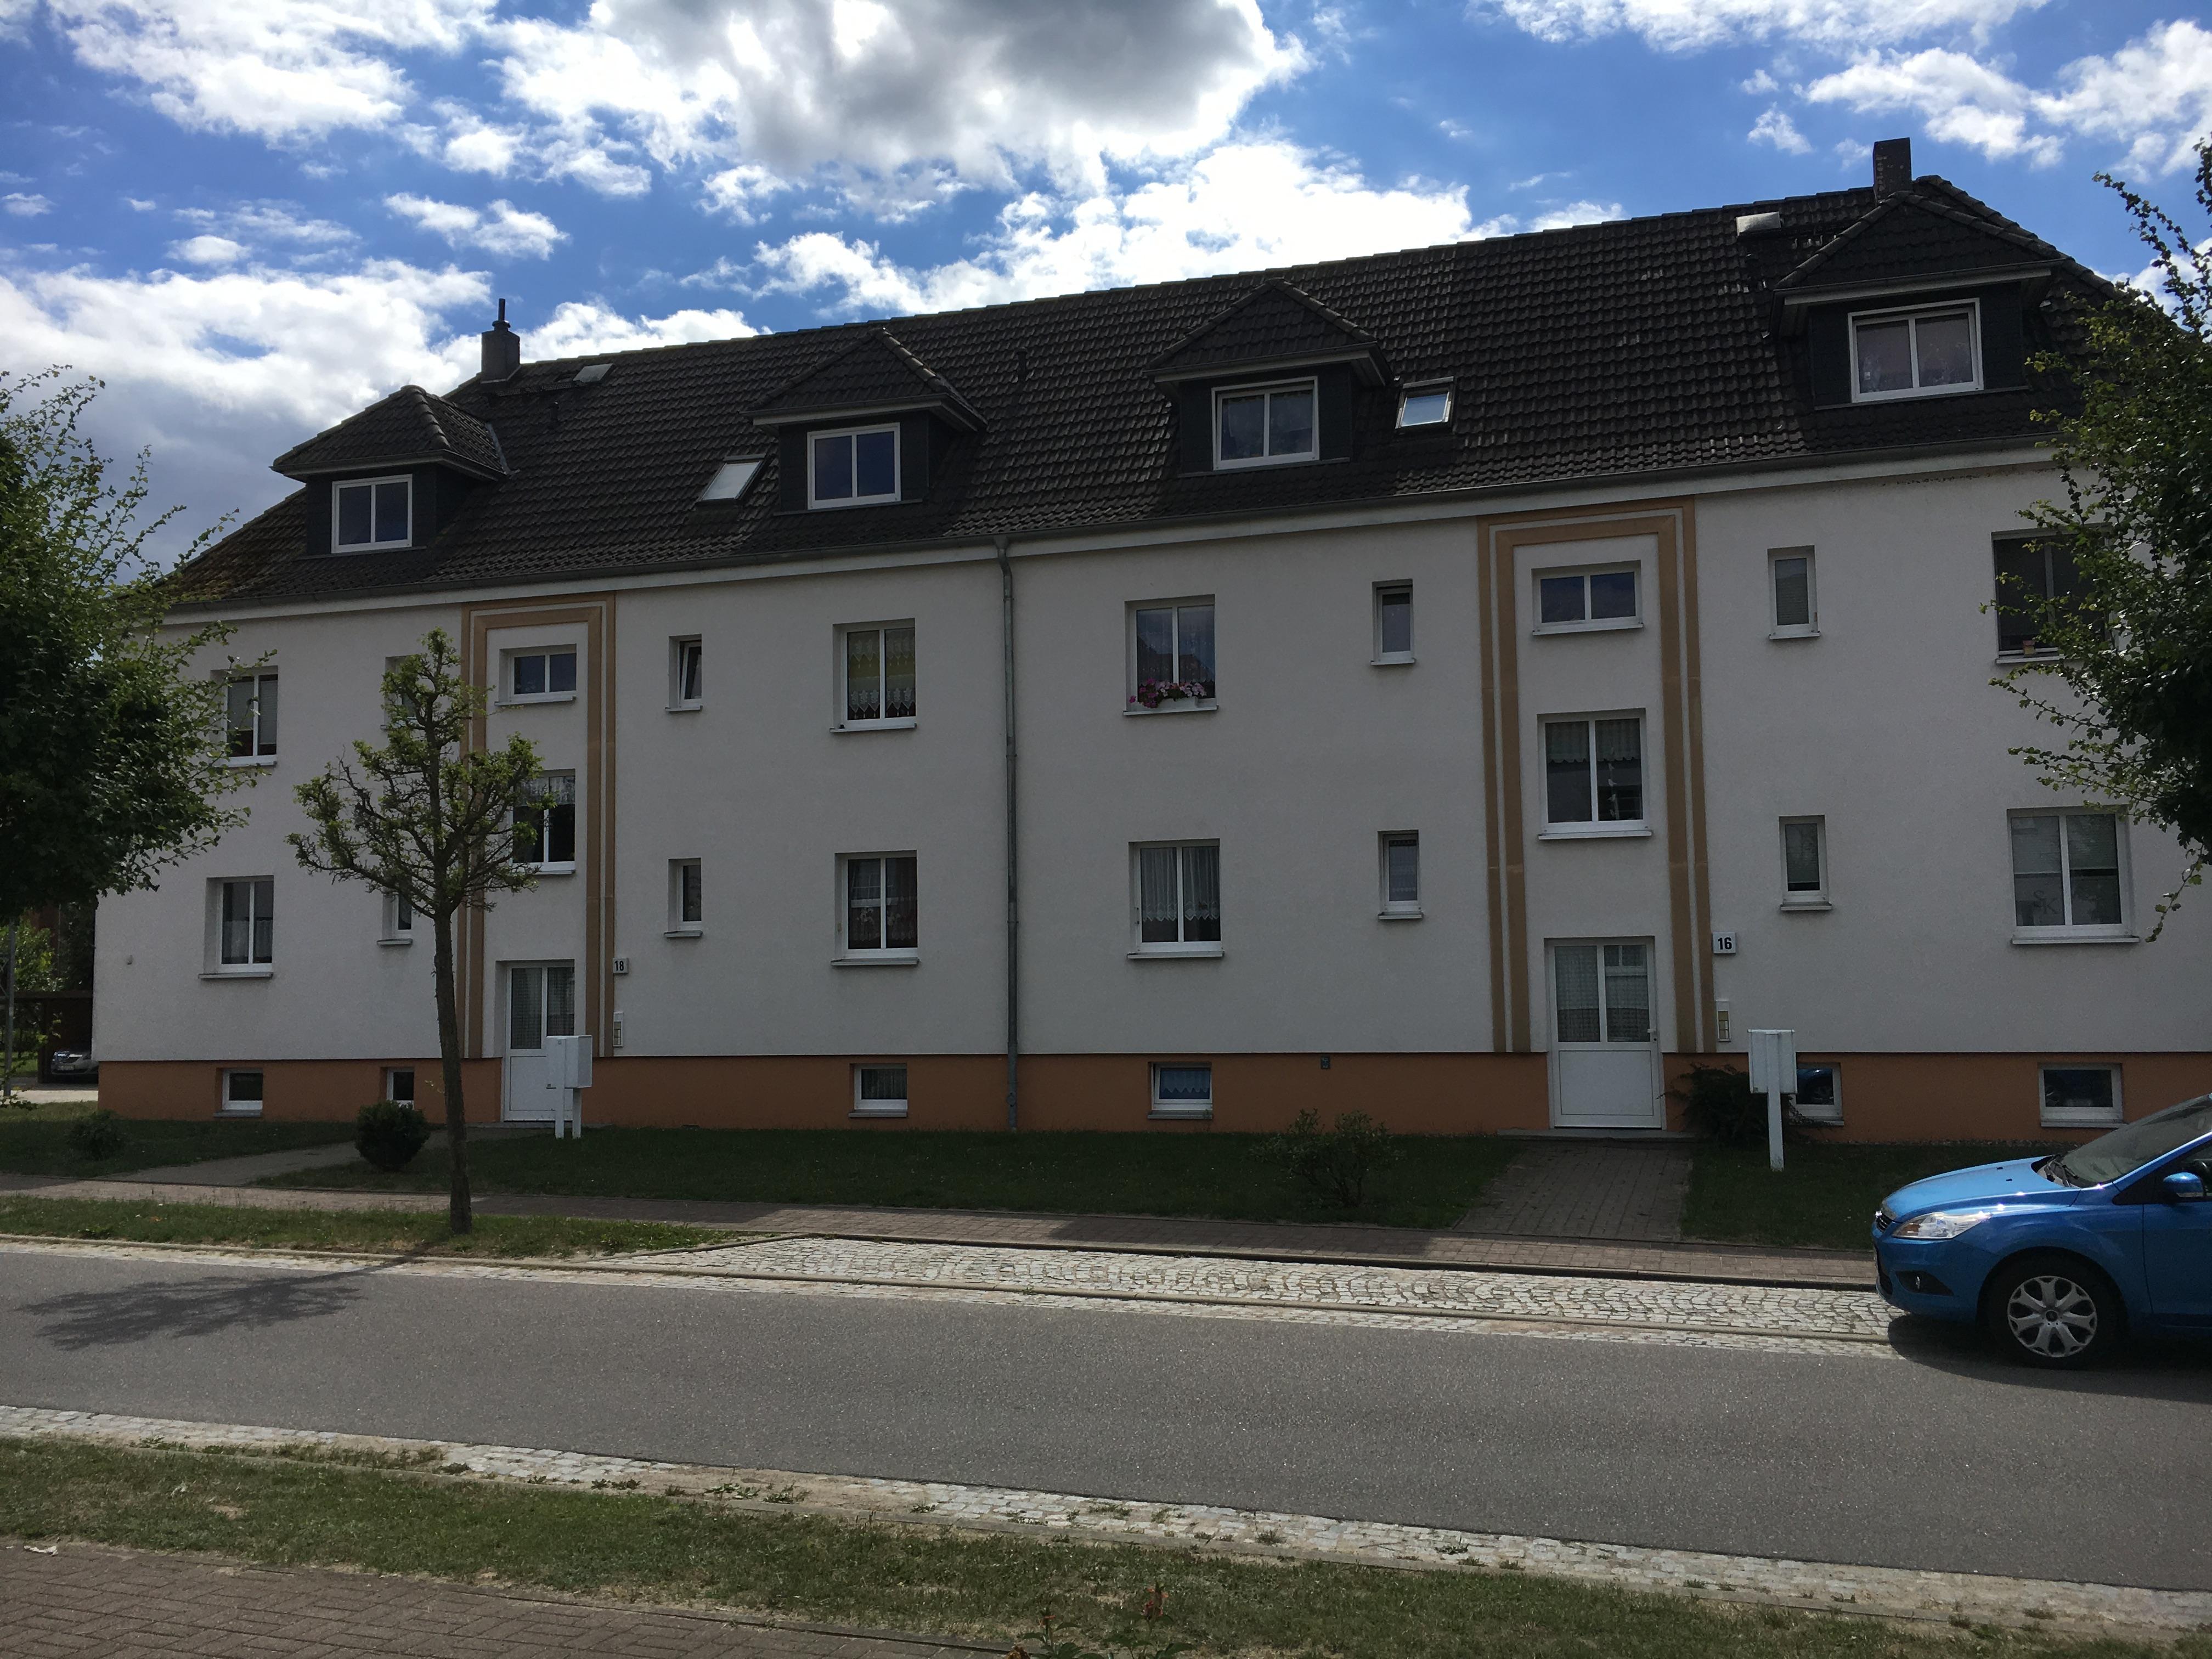 Gerhardt-Hauptmann-Straße 16, 18